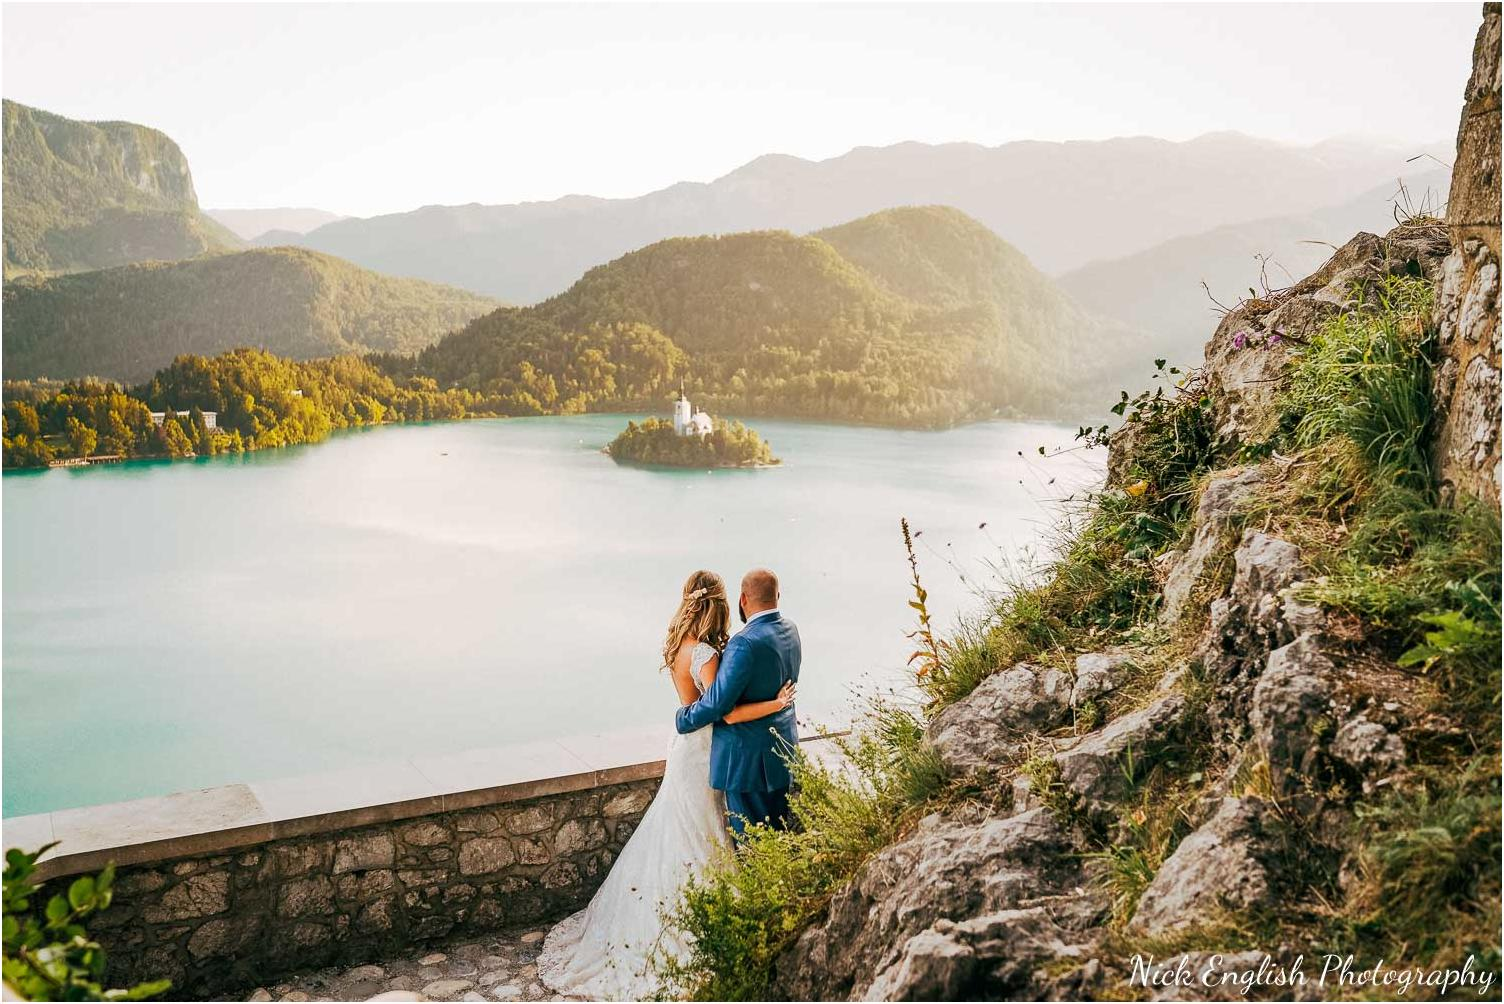 Destination_Wedding_Photographer_Slovenia_Nick_English_Photography-70-28.jpg